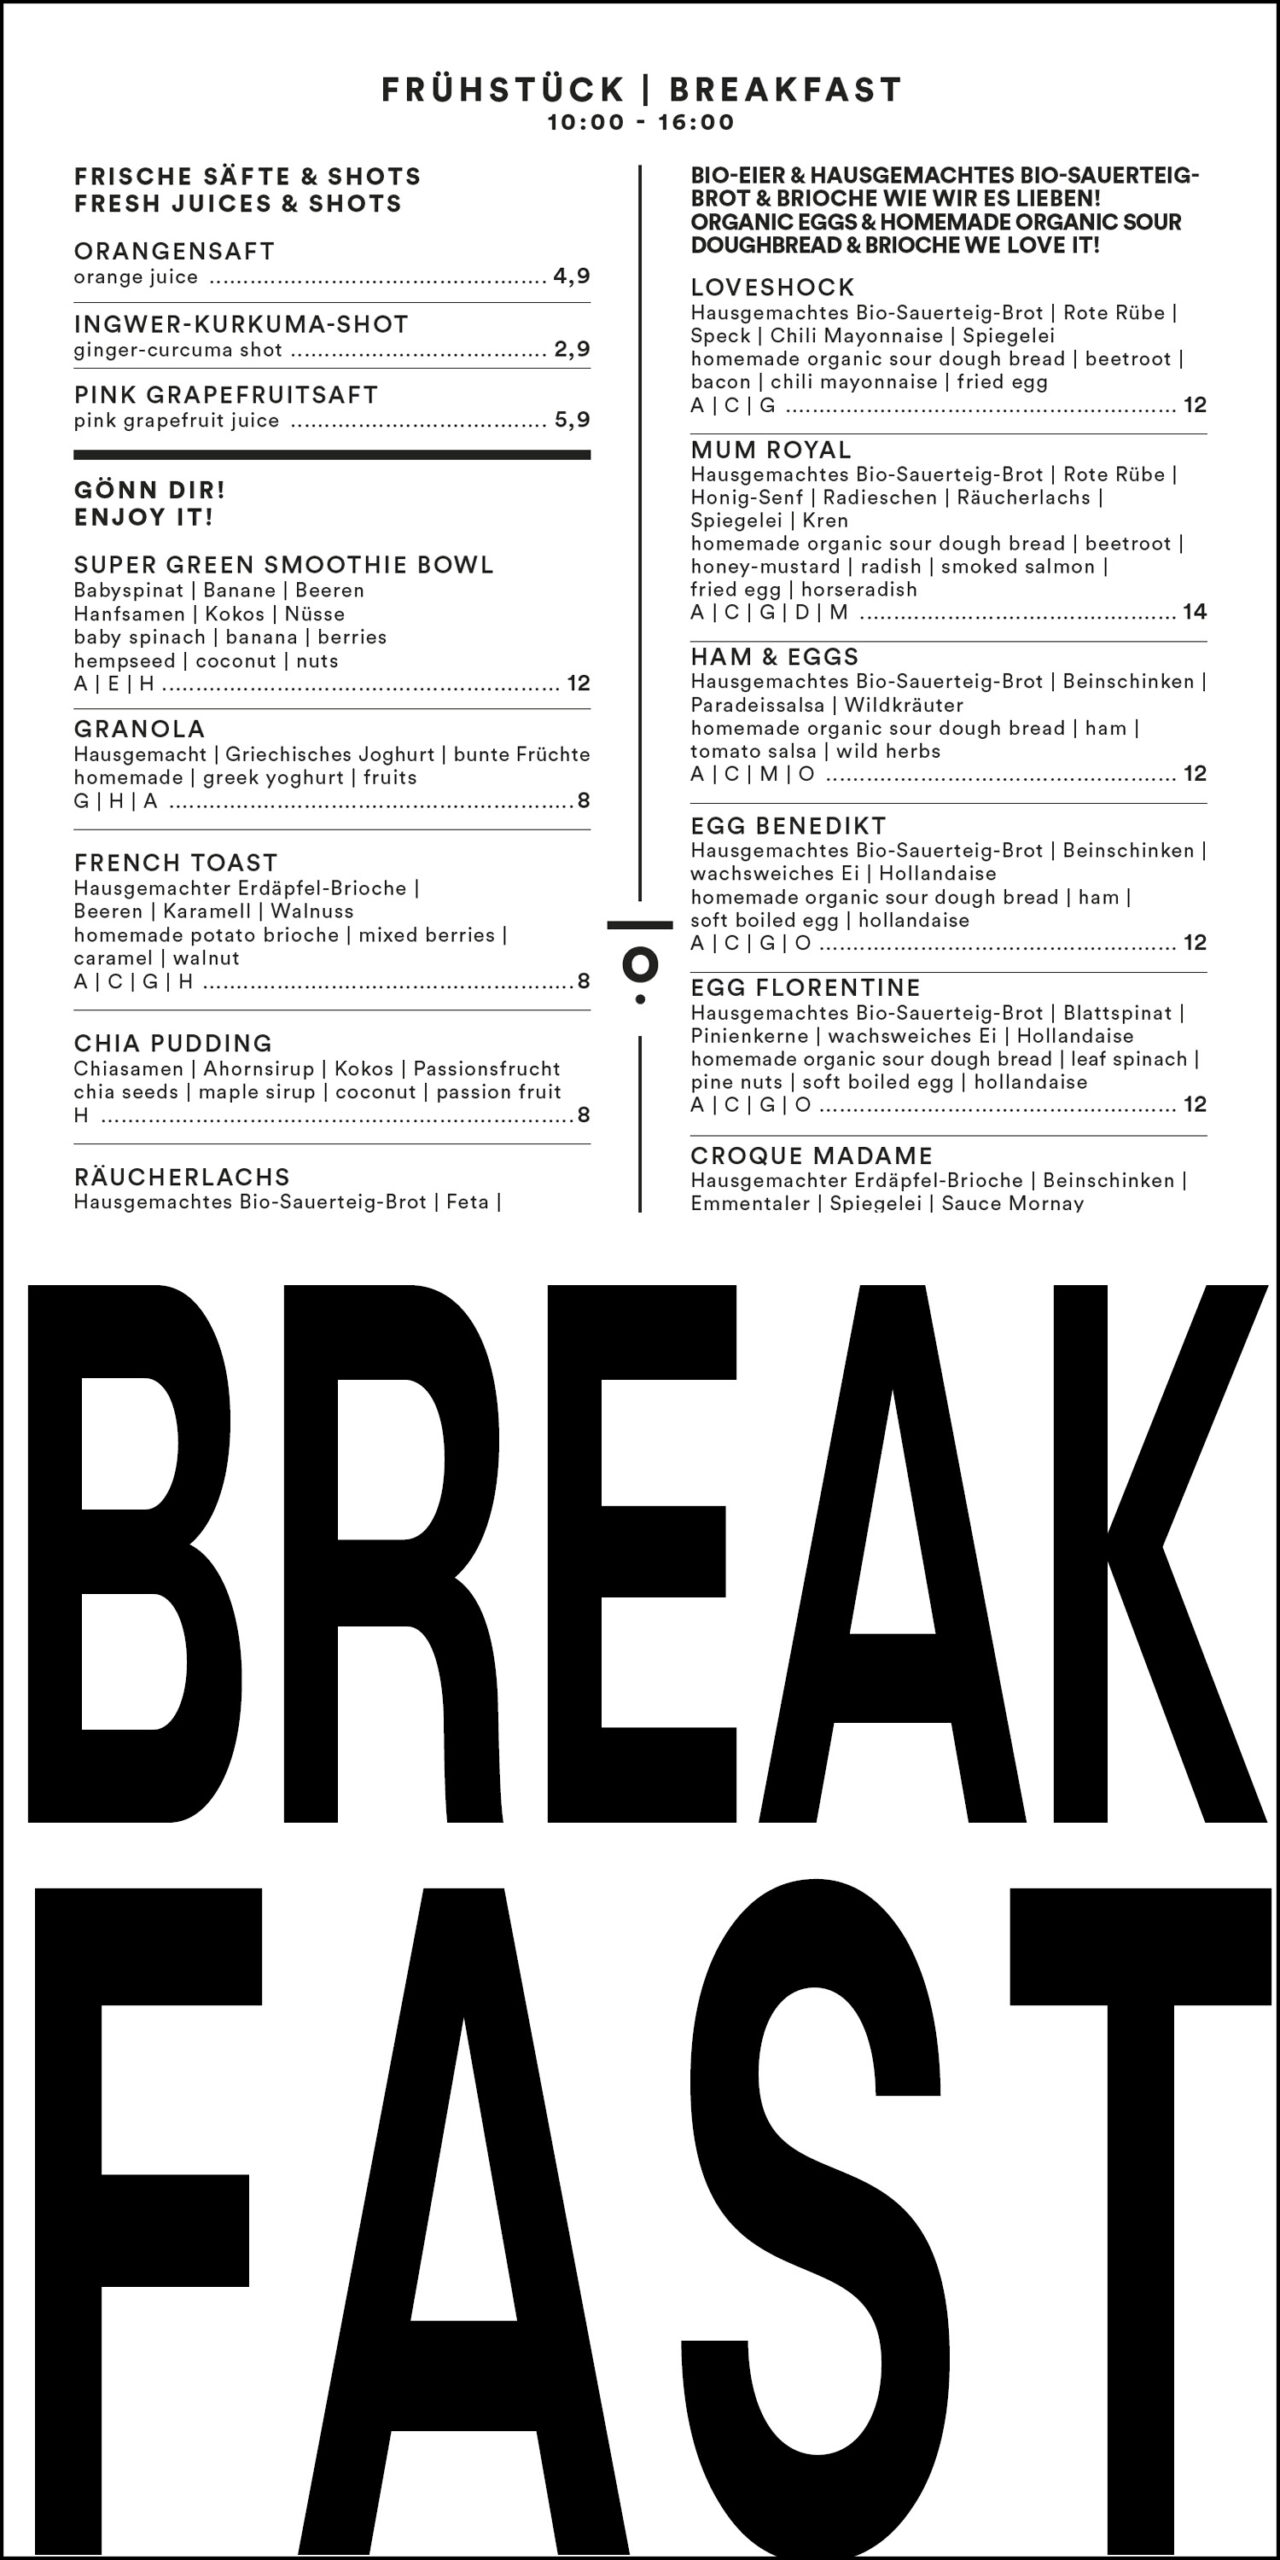 salonplafond-wien-speisekarte-fruehstueck-breakfast-menu-vienna